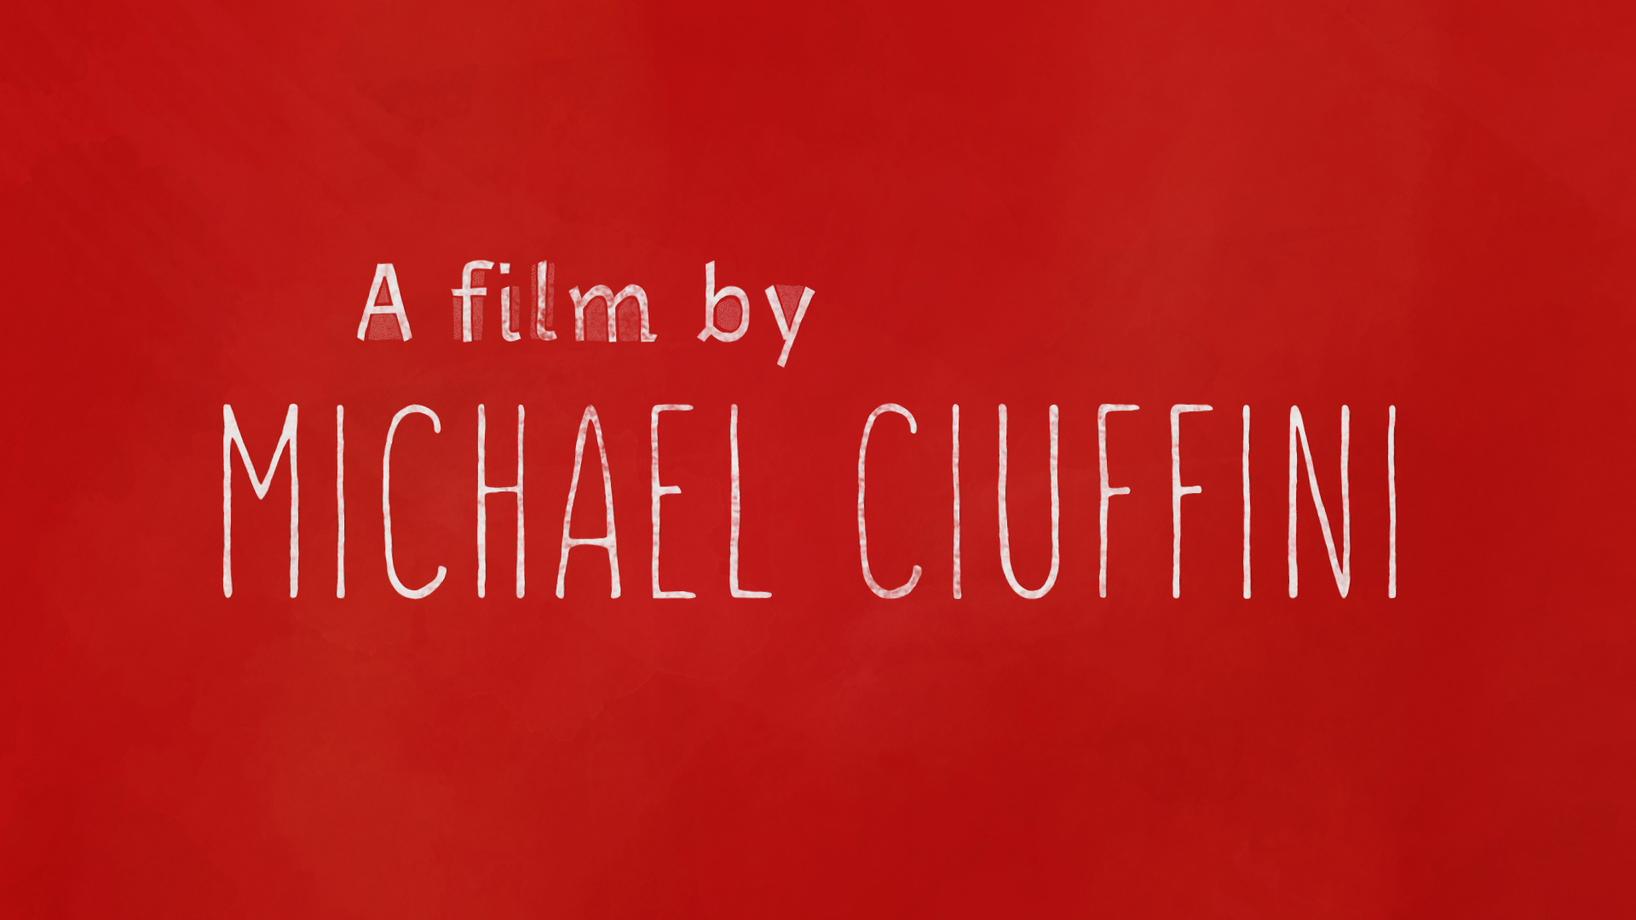 Credits-02-MichaelCiuffini 2.jpg